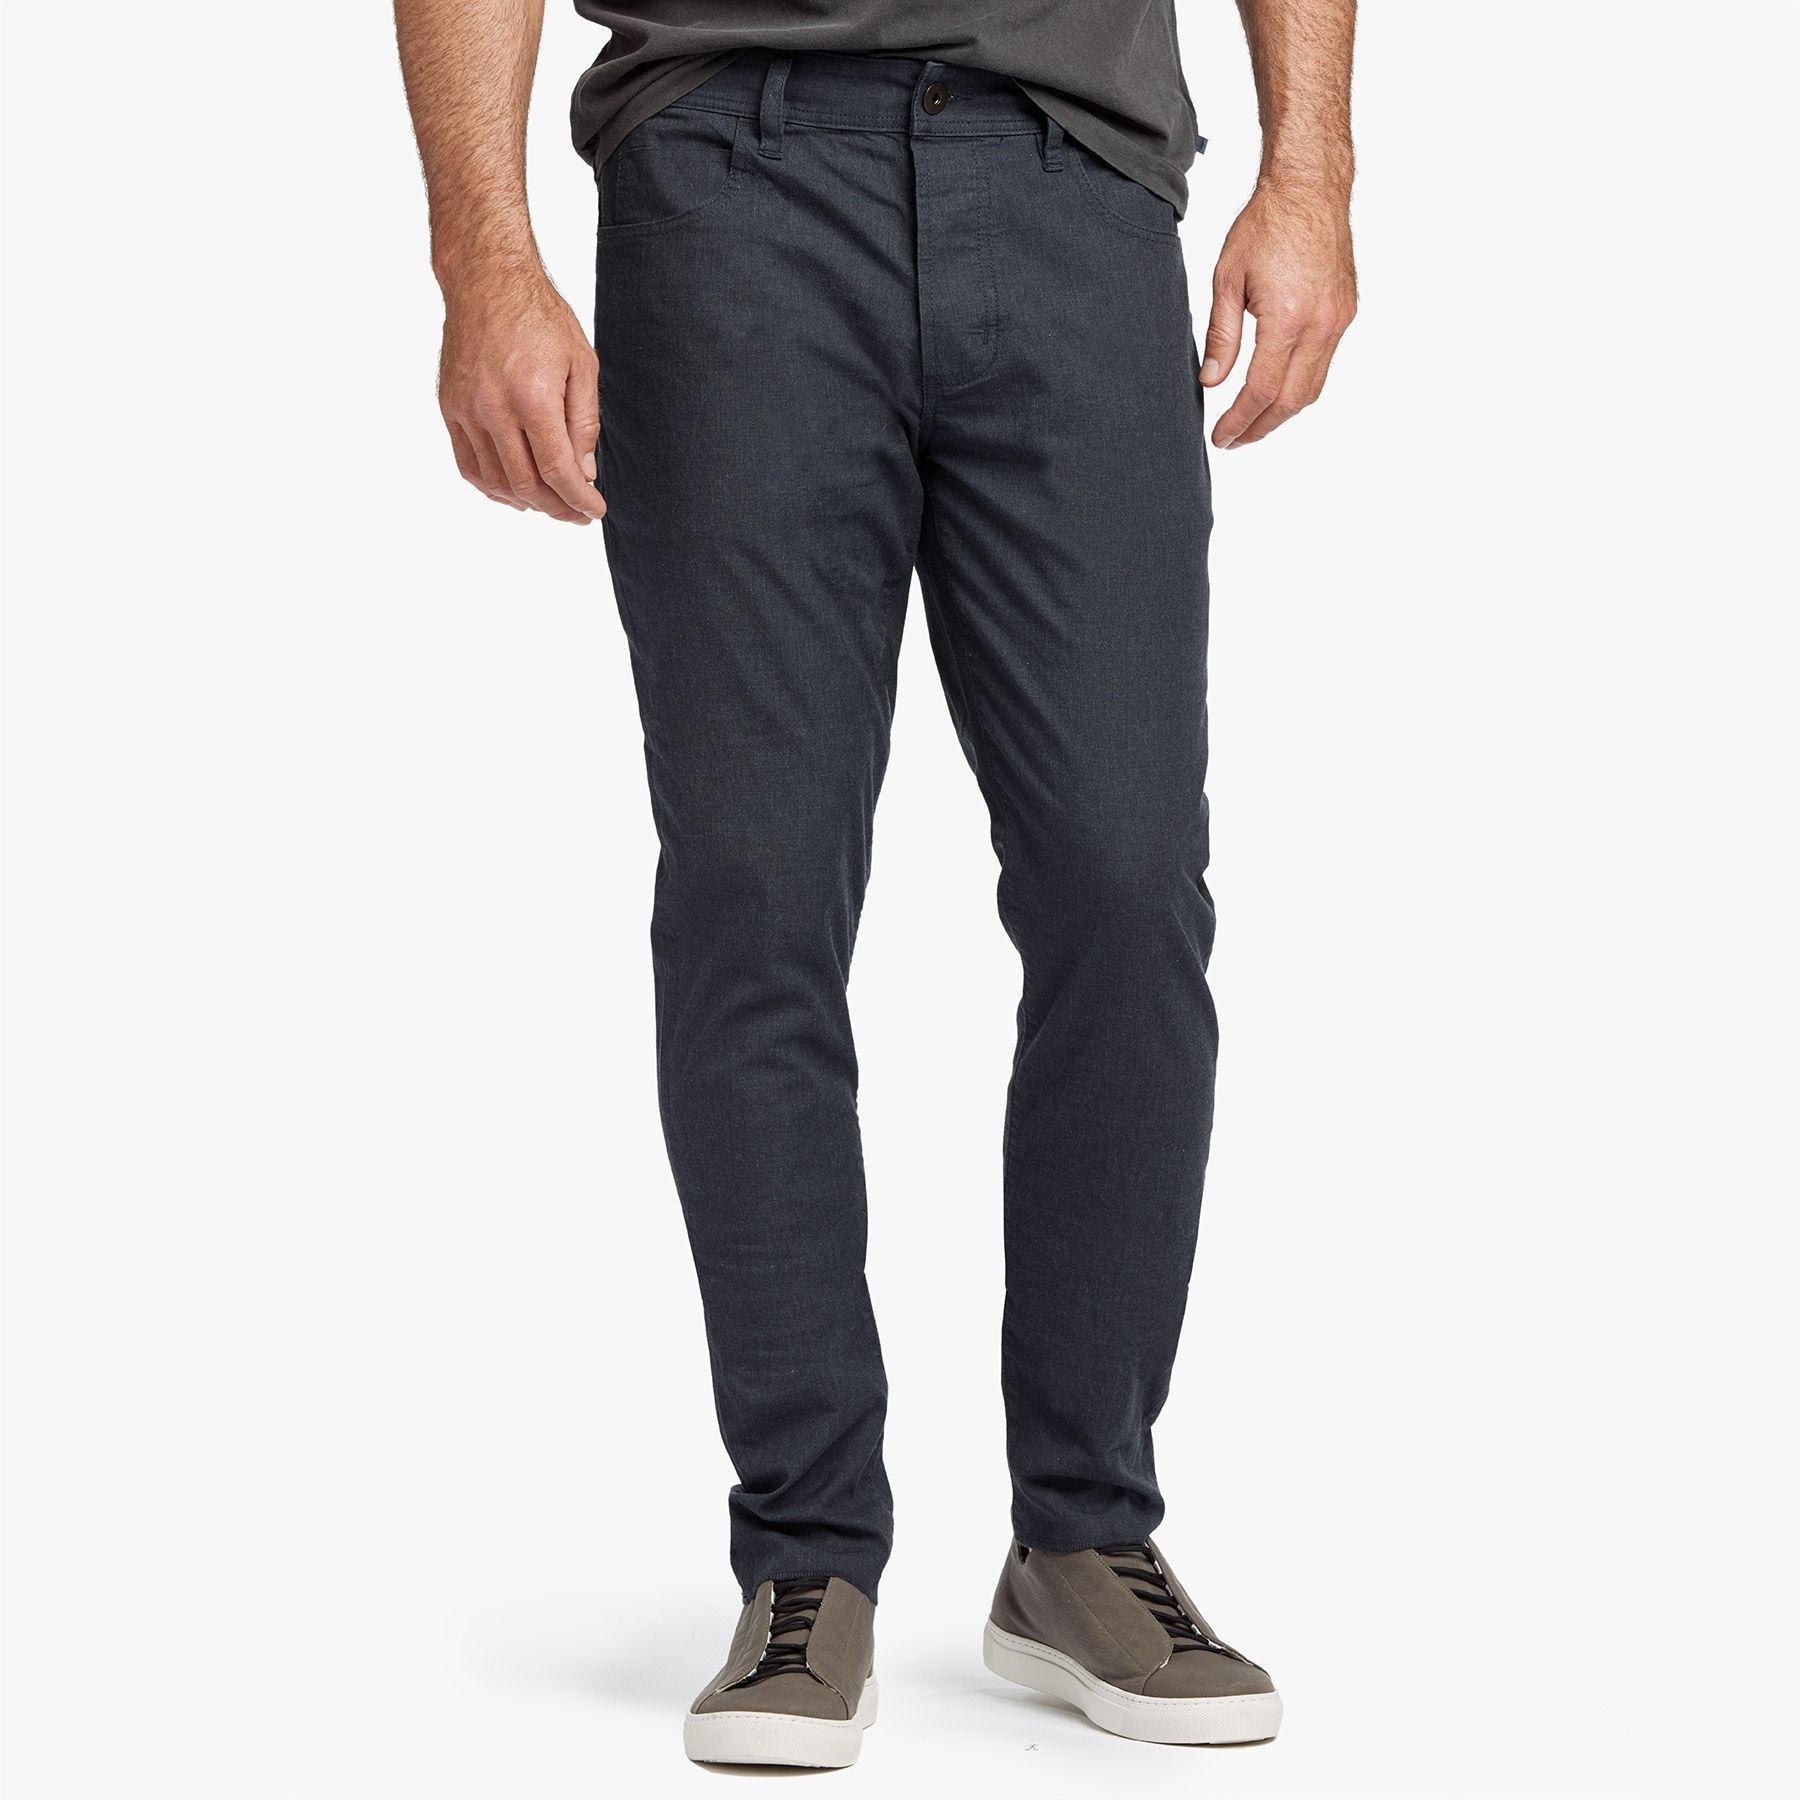 c919d6a5873e James Perse Cotton Canvas 5-pocket Pant in Blue for Men - Lyst